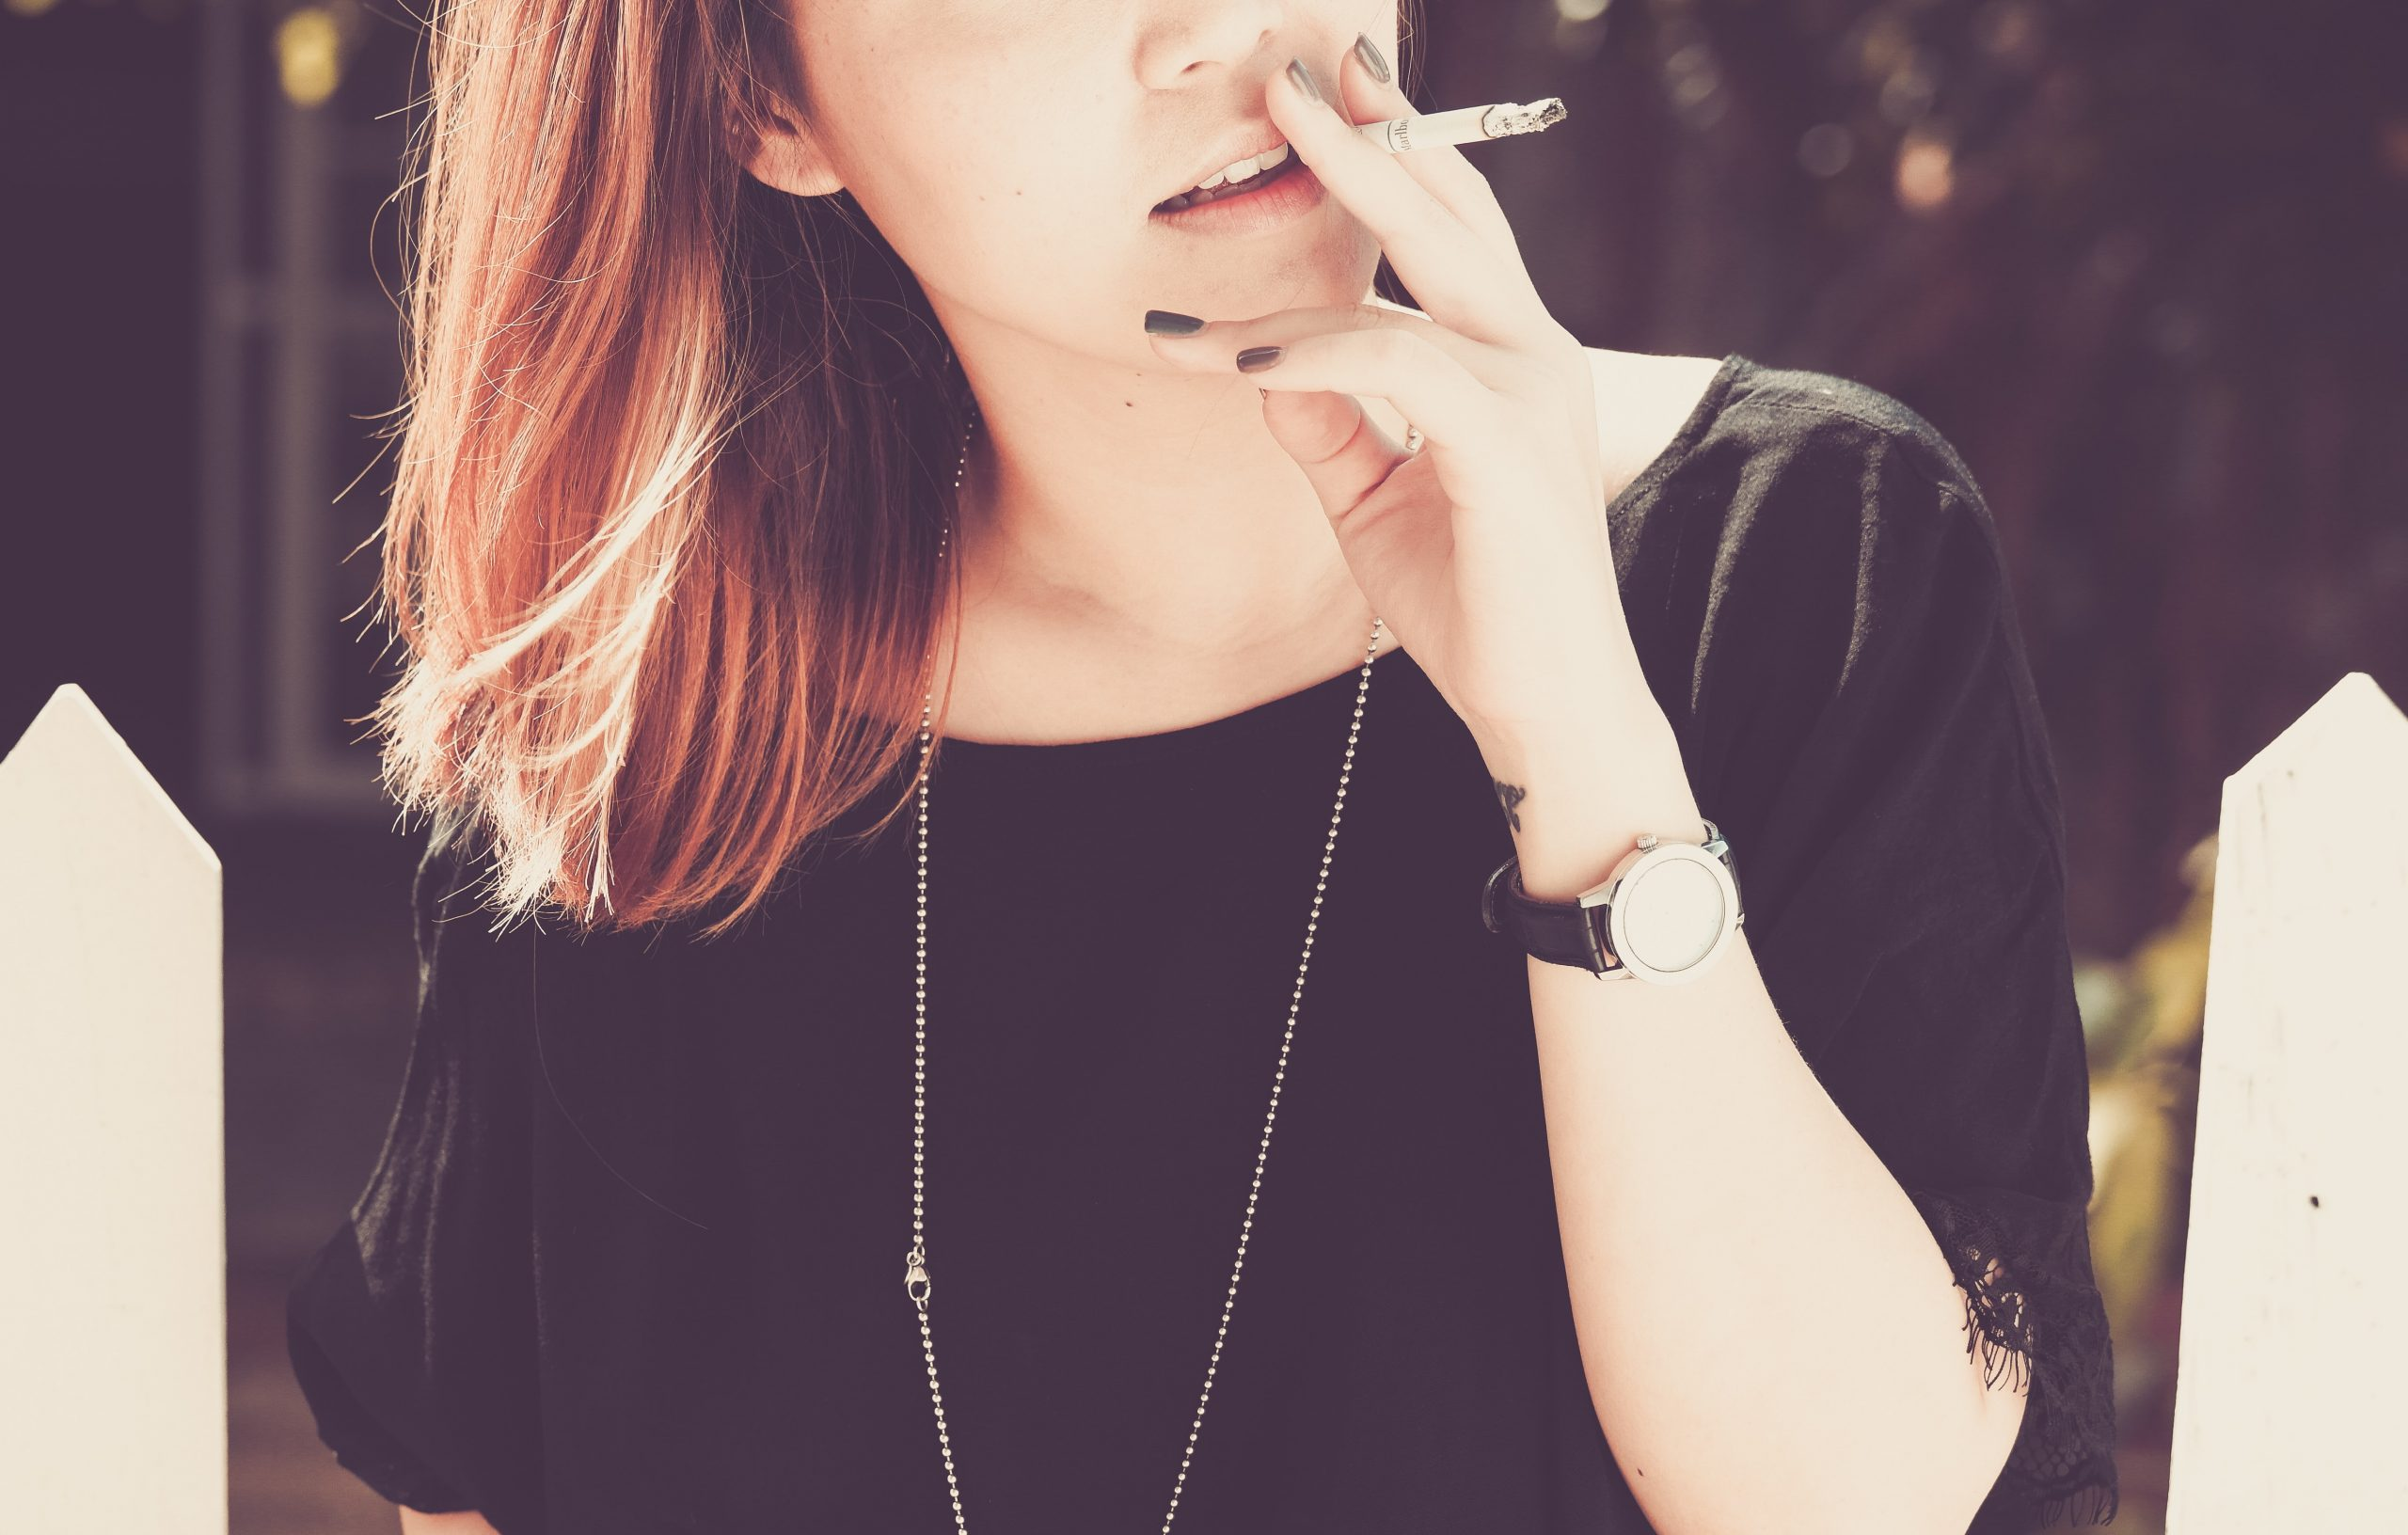 eeuwige roker